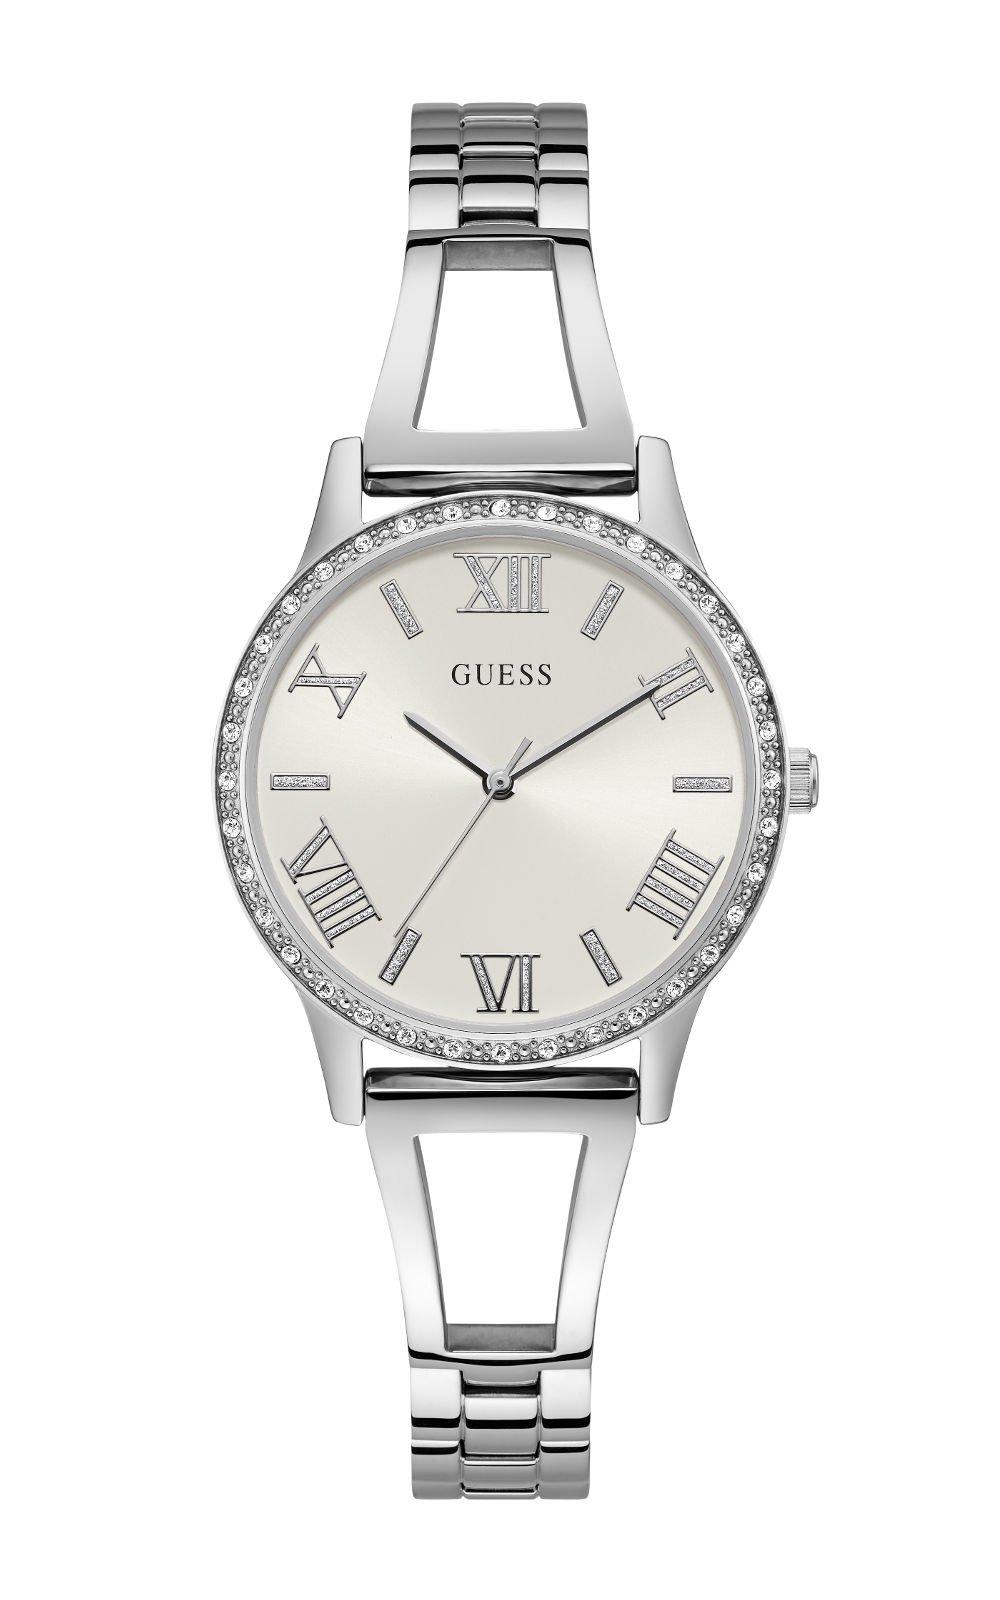 GUESS W1208L1 Γυναικείο Ρολόι Quartz Ακριβείας ce5fec2ff85